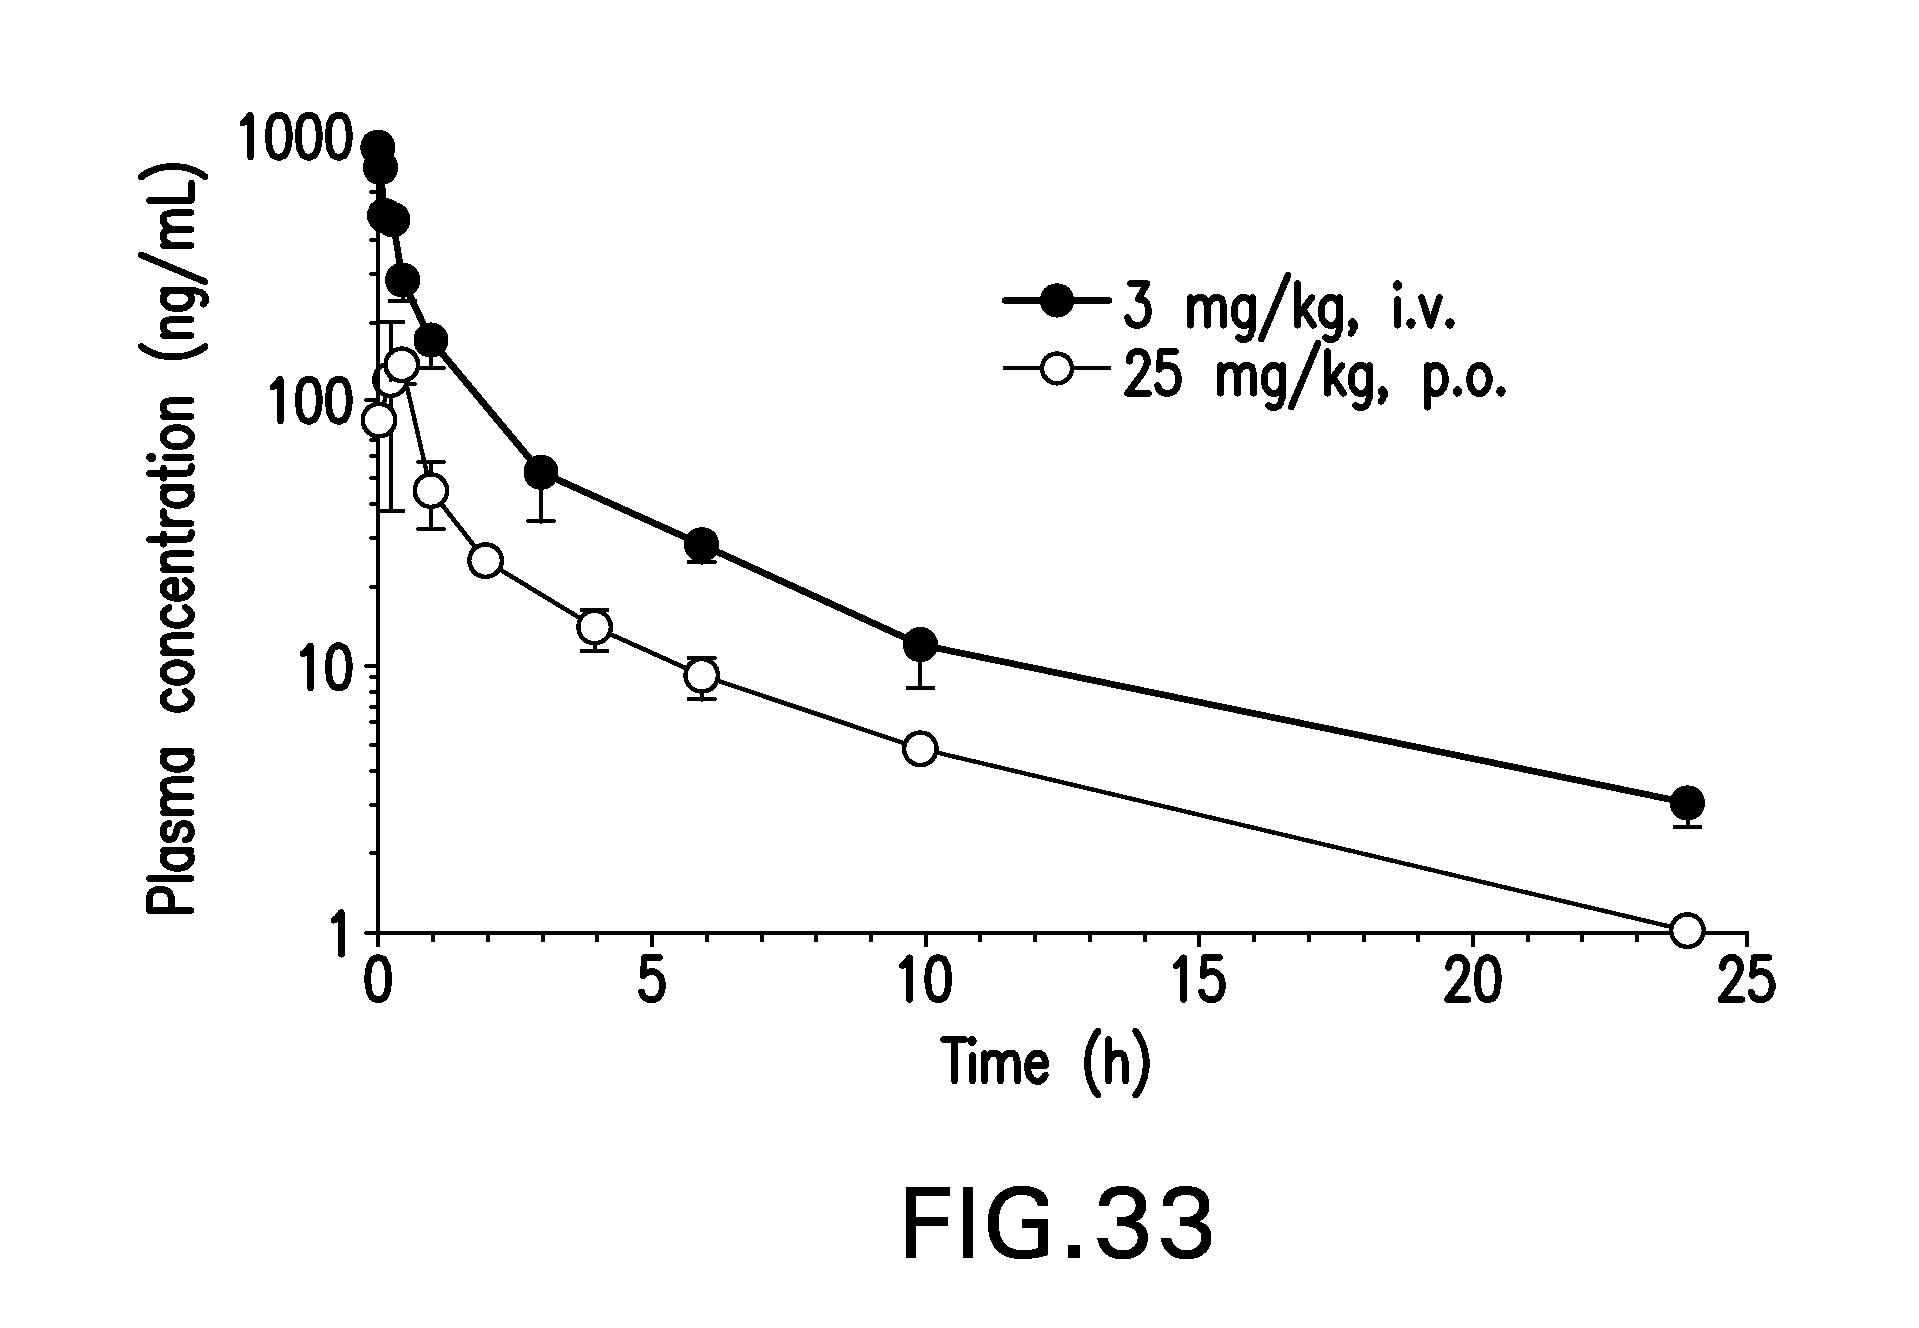 Ethylenediamine (EDA)